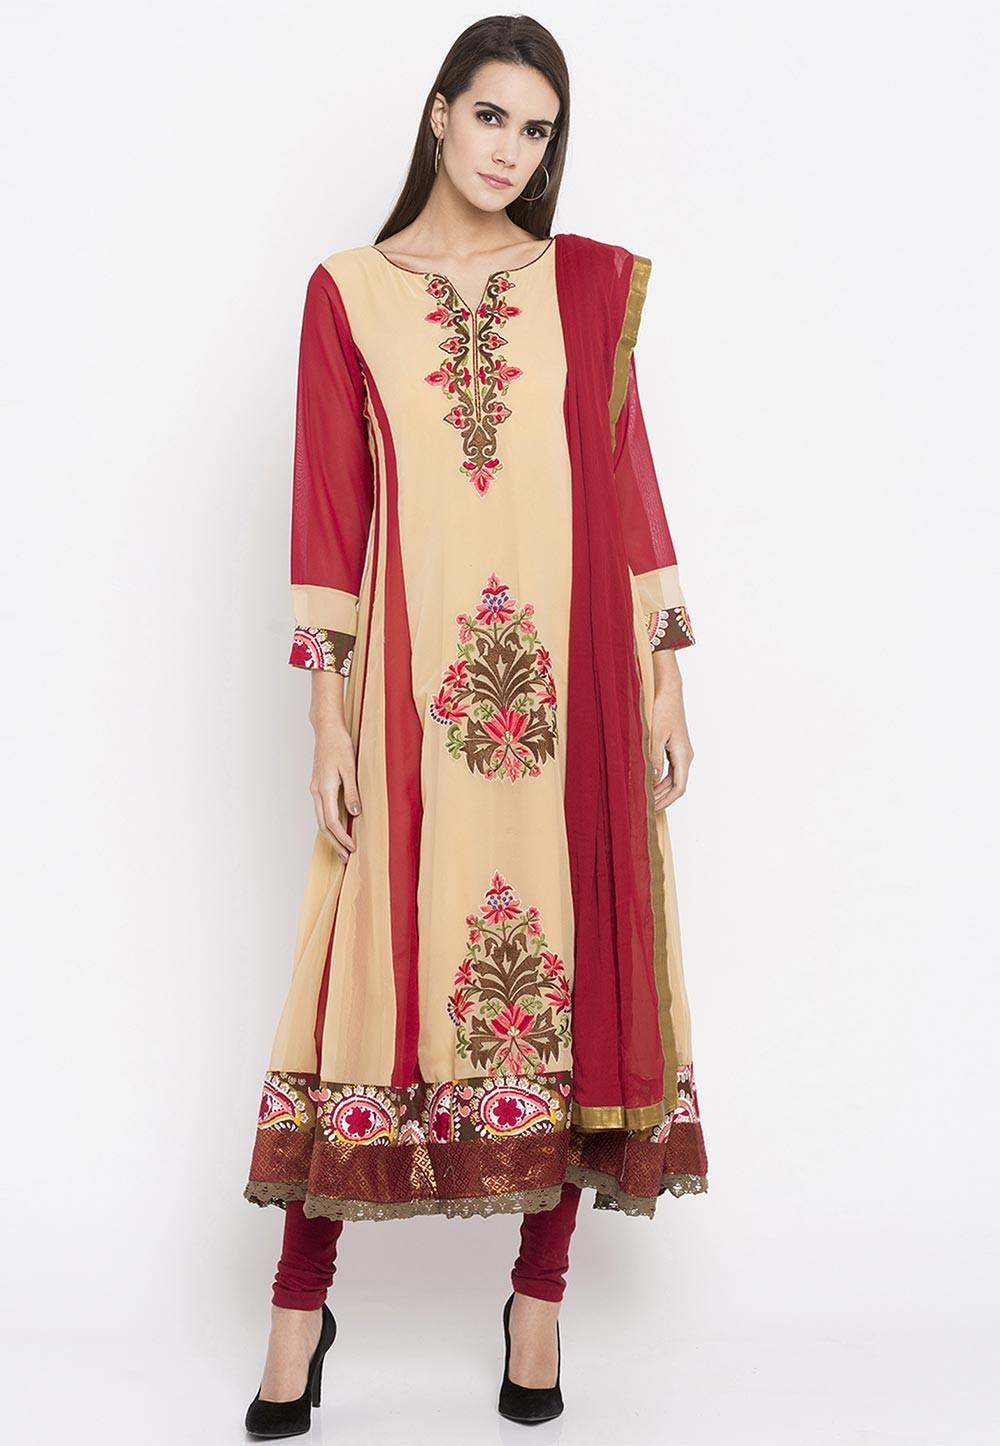 Beige Color Faux Georgette Readymade Salwar Kameez